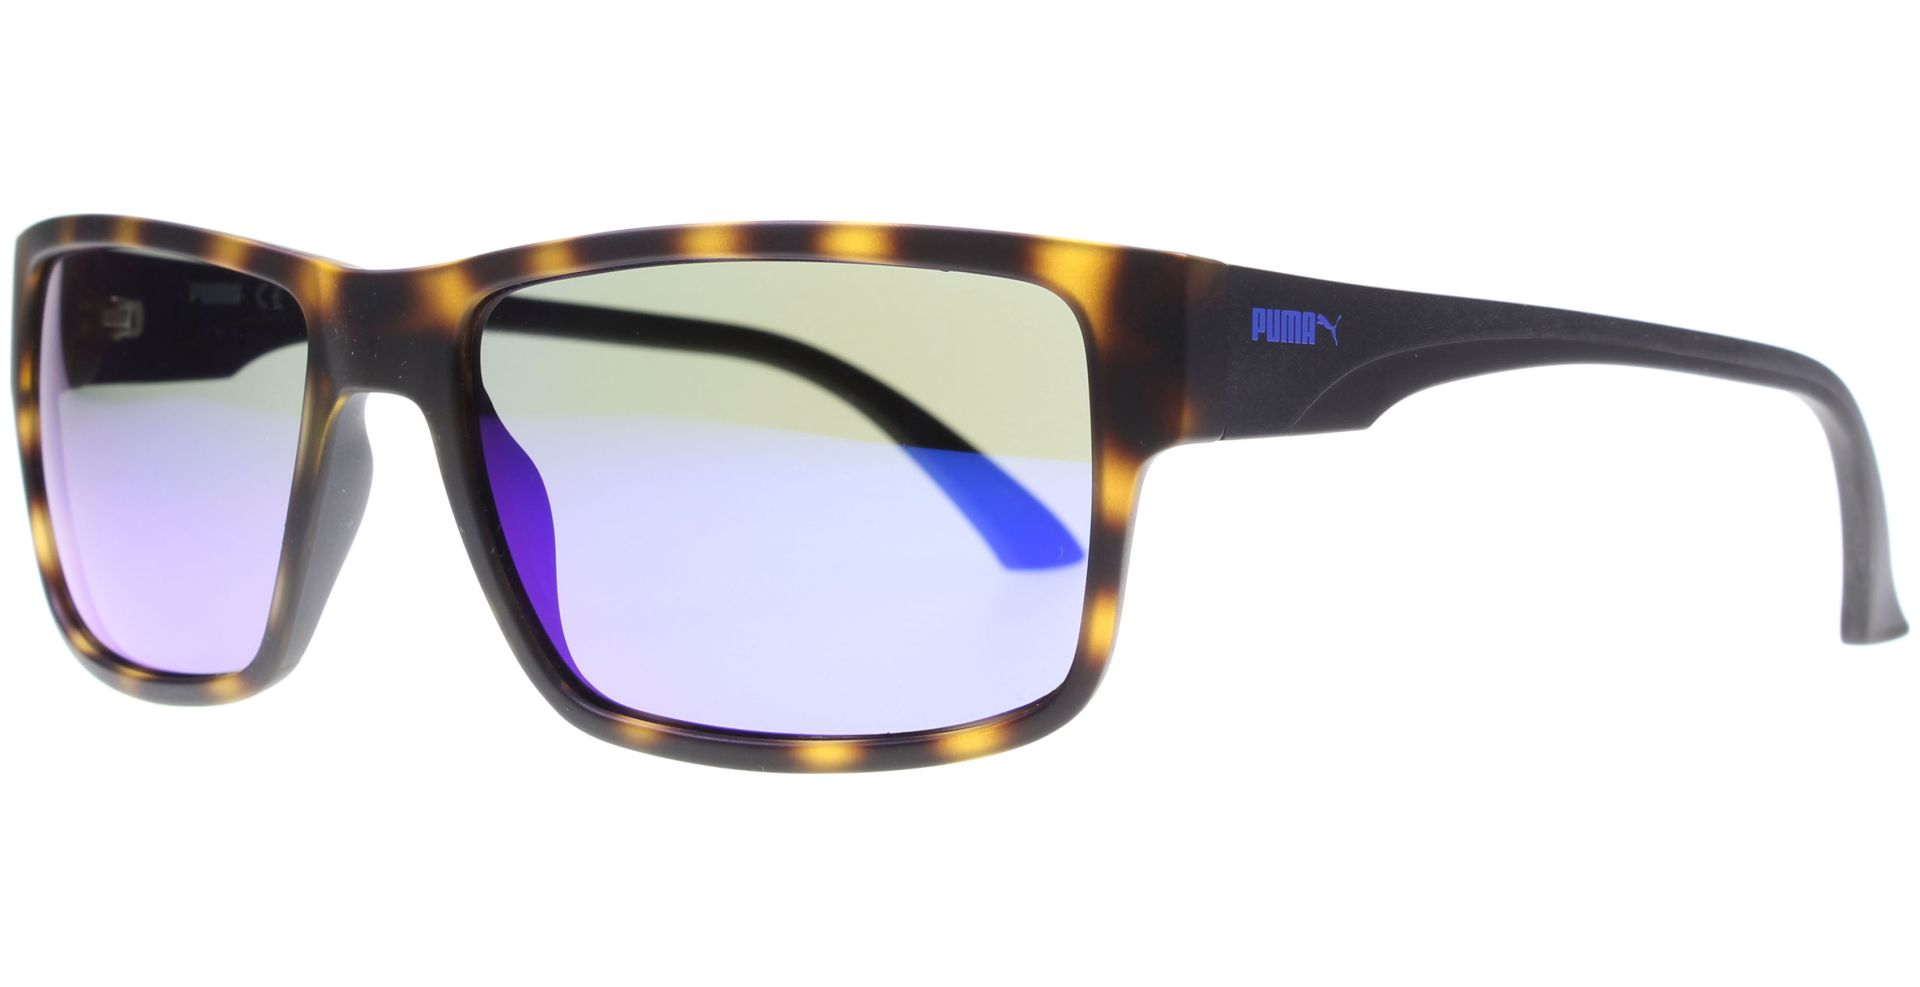 Puma Shoreditch Sonnenbrille Tortoise 003 57mm O8rjuO